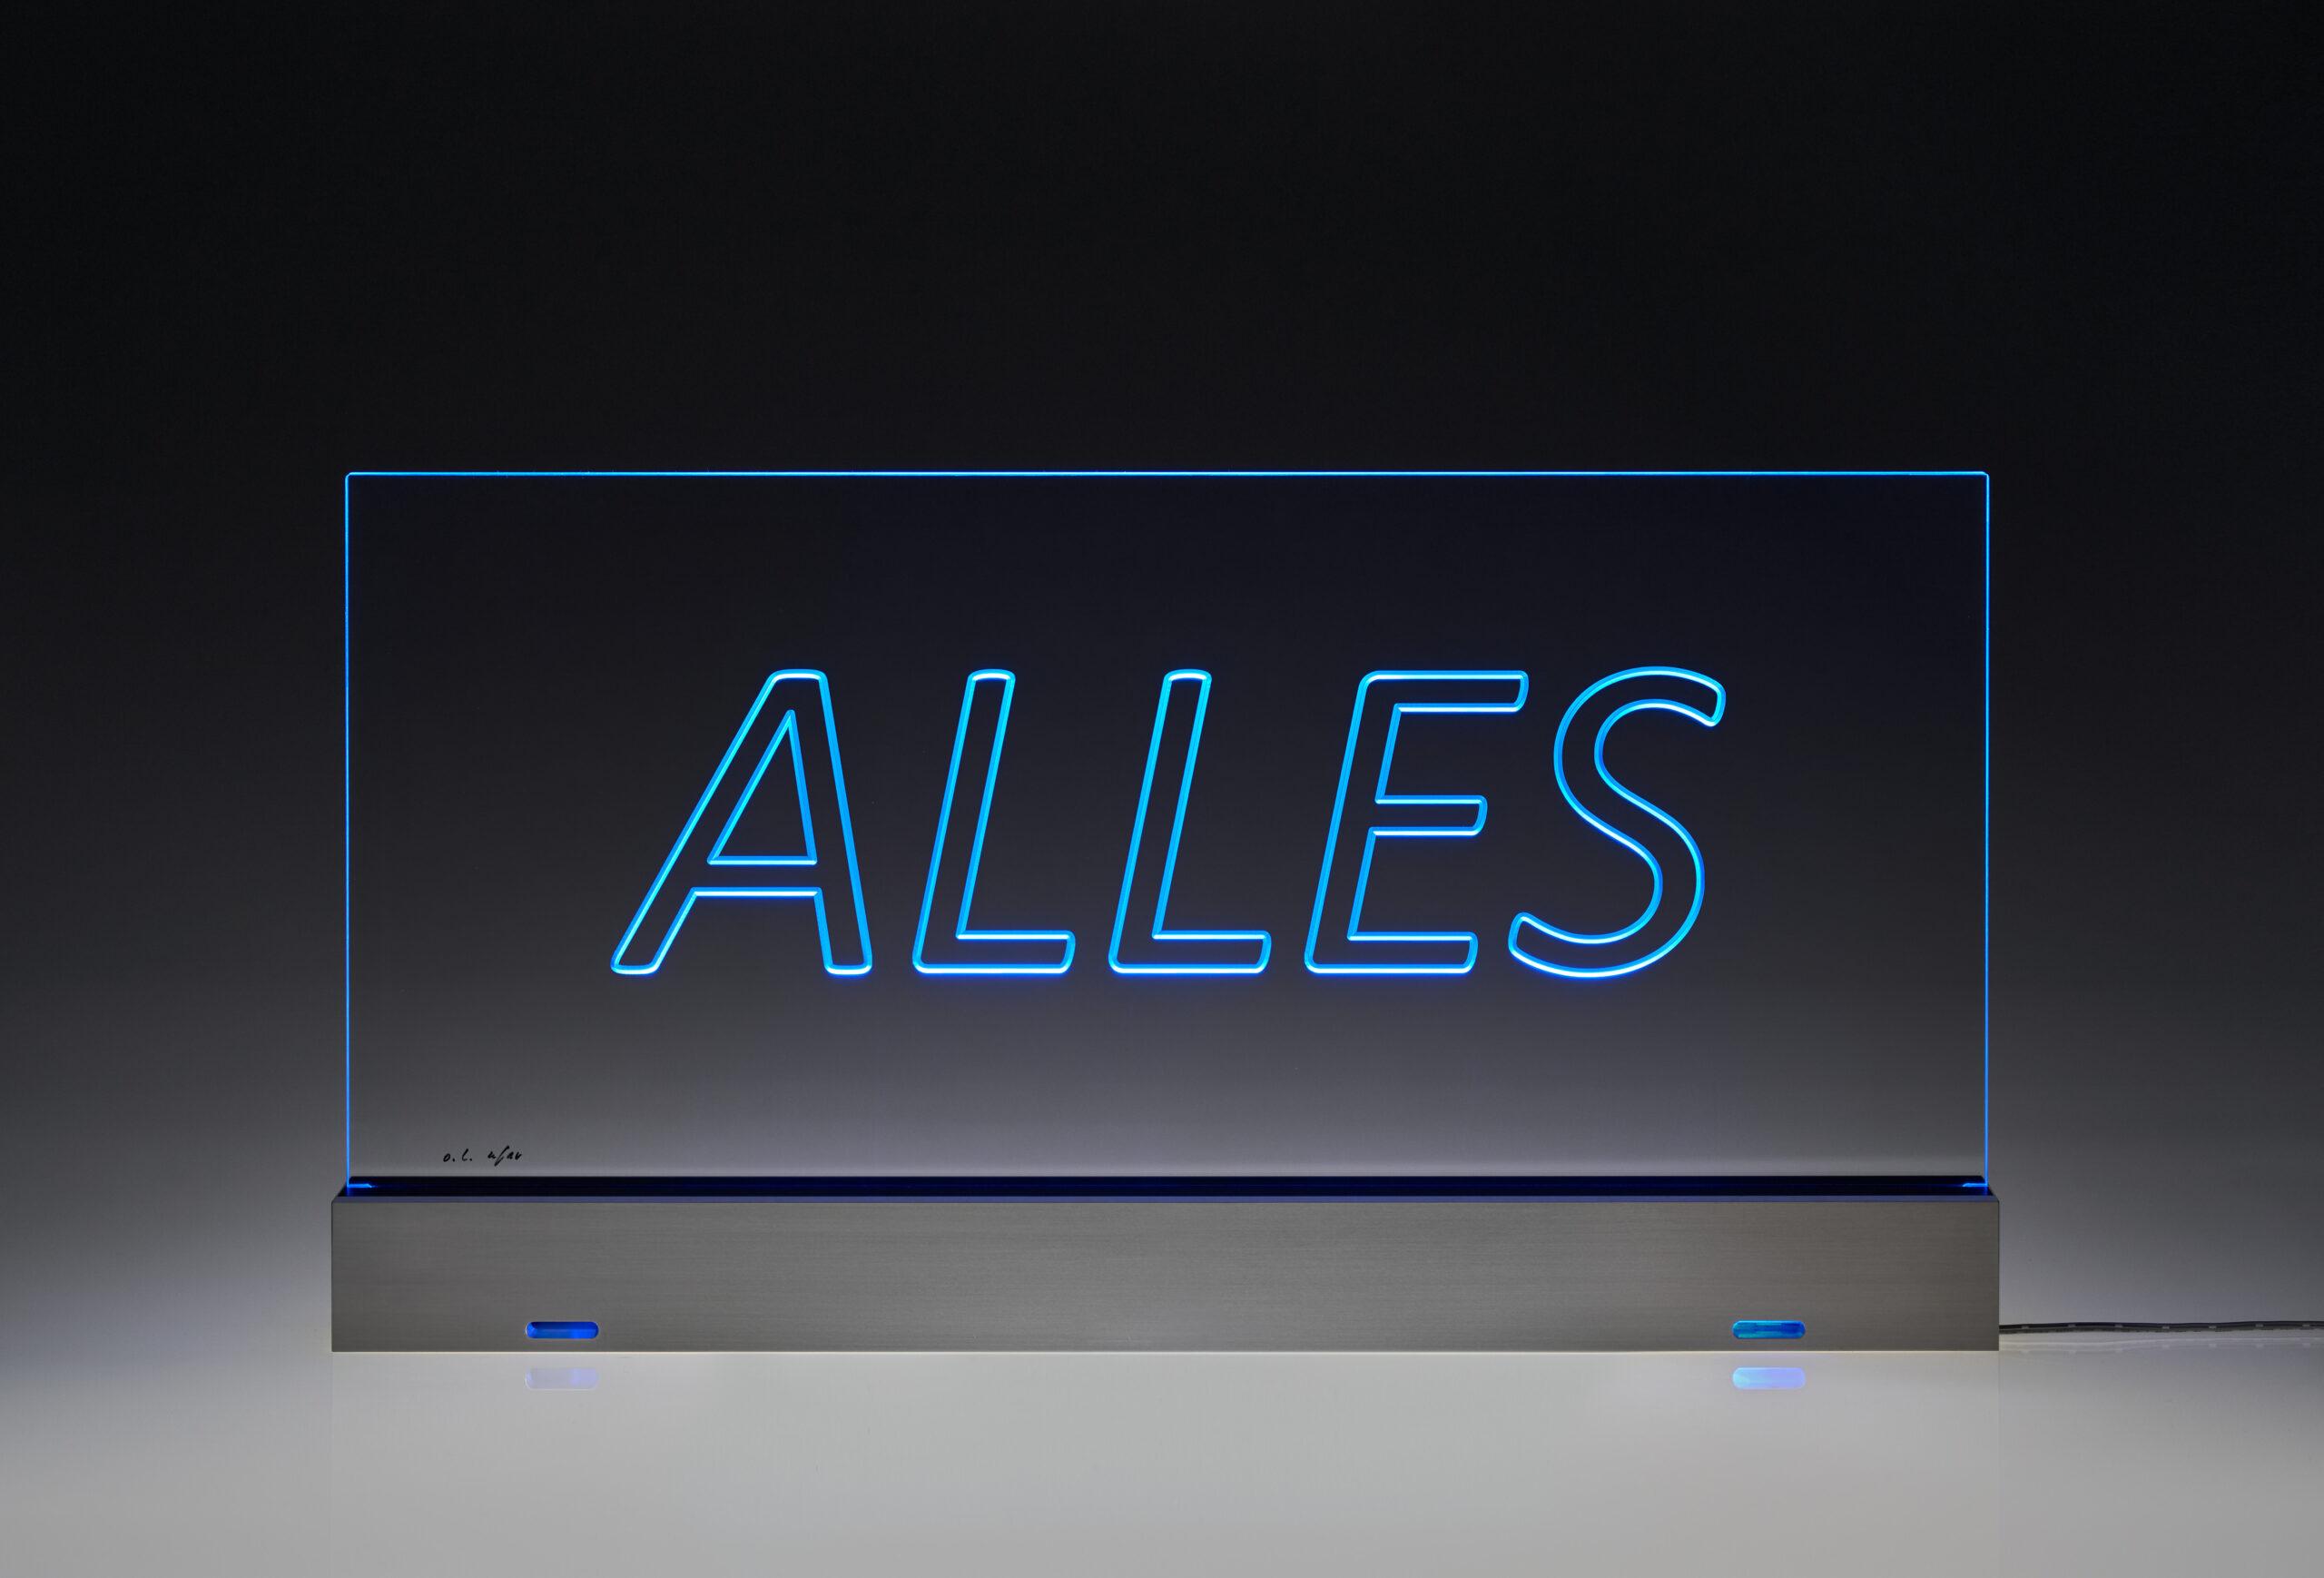 mfar_8065_ALLES_dunkel_blue